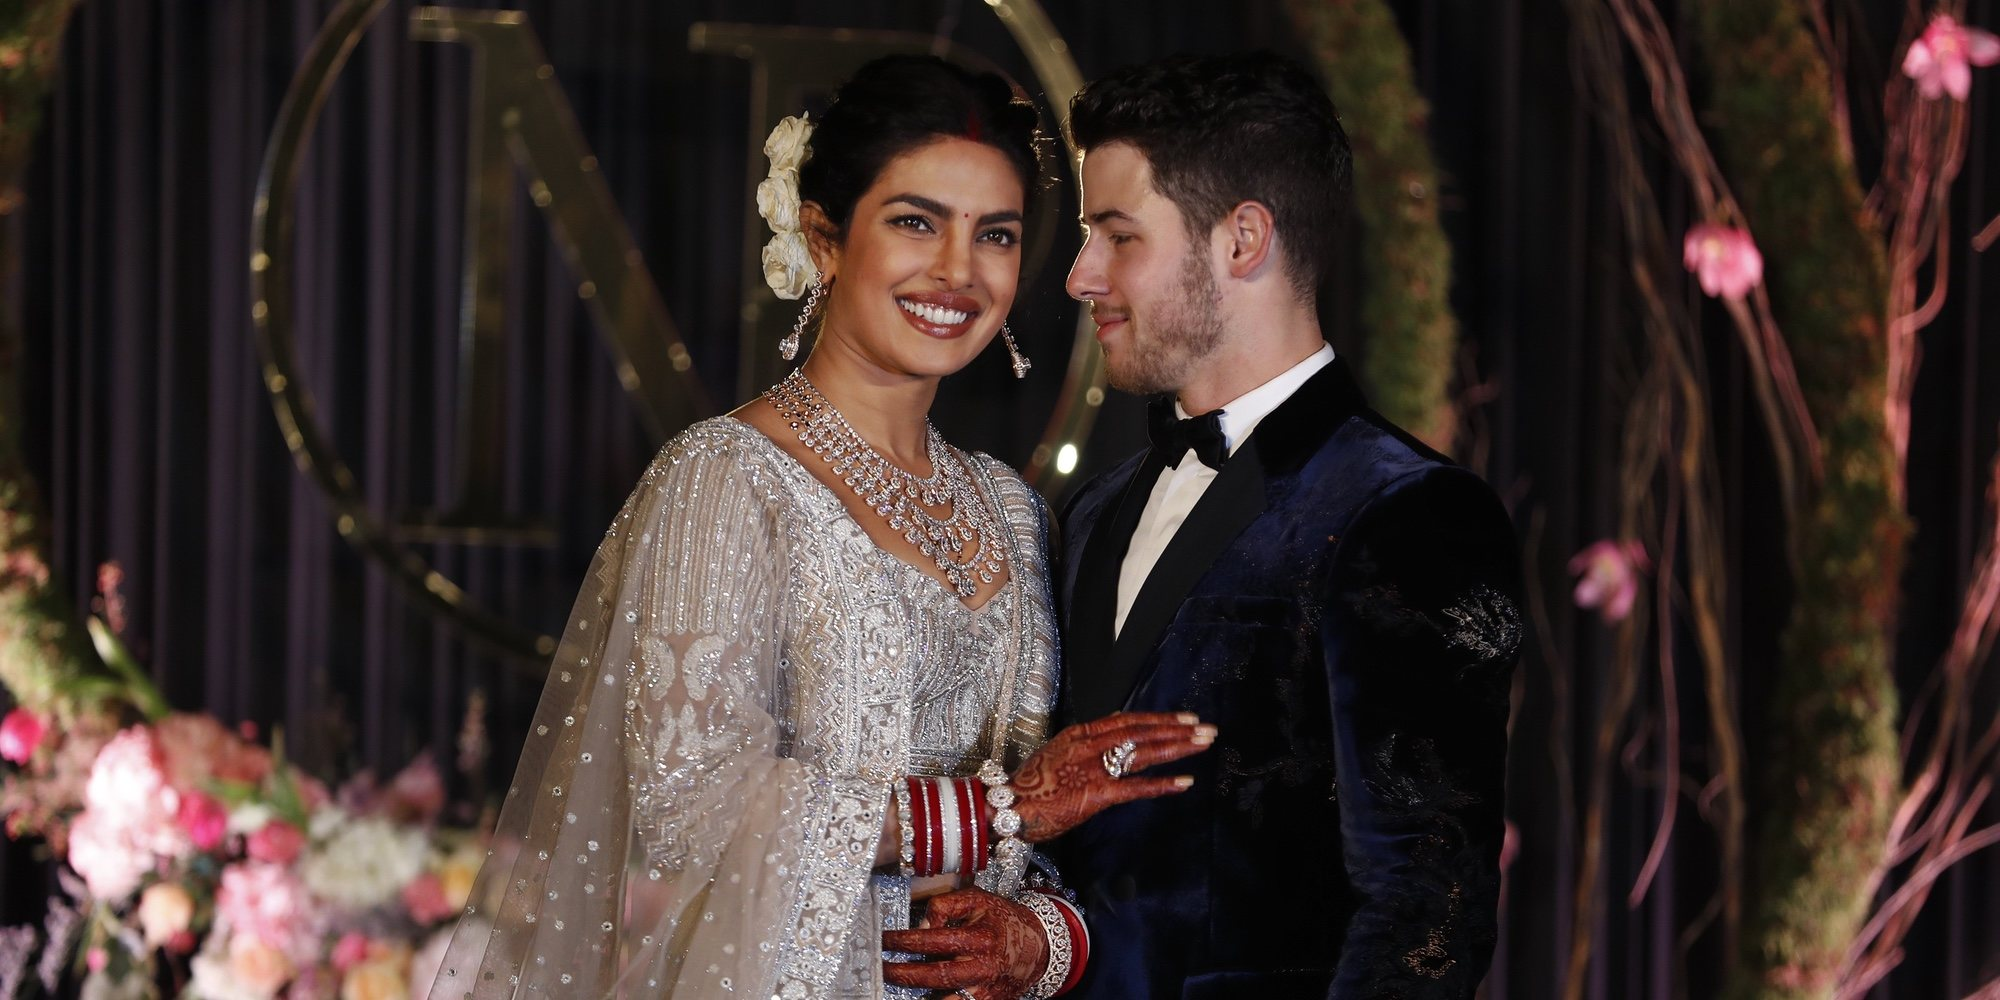 La romántica historia de amor de Priyanka Chopra y Nick Jonas